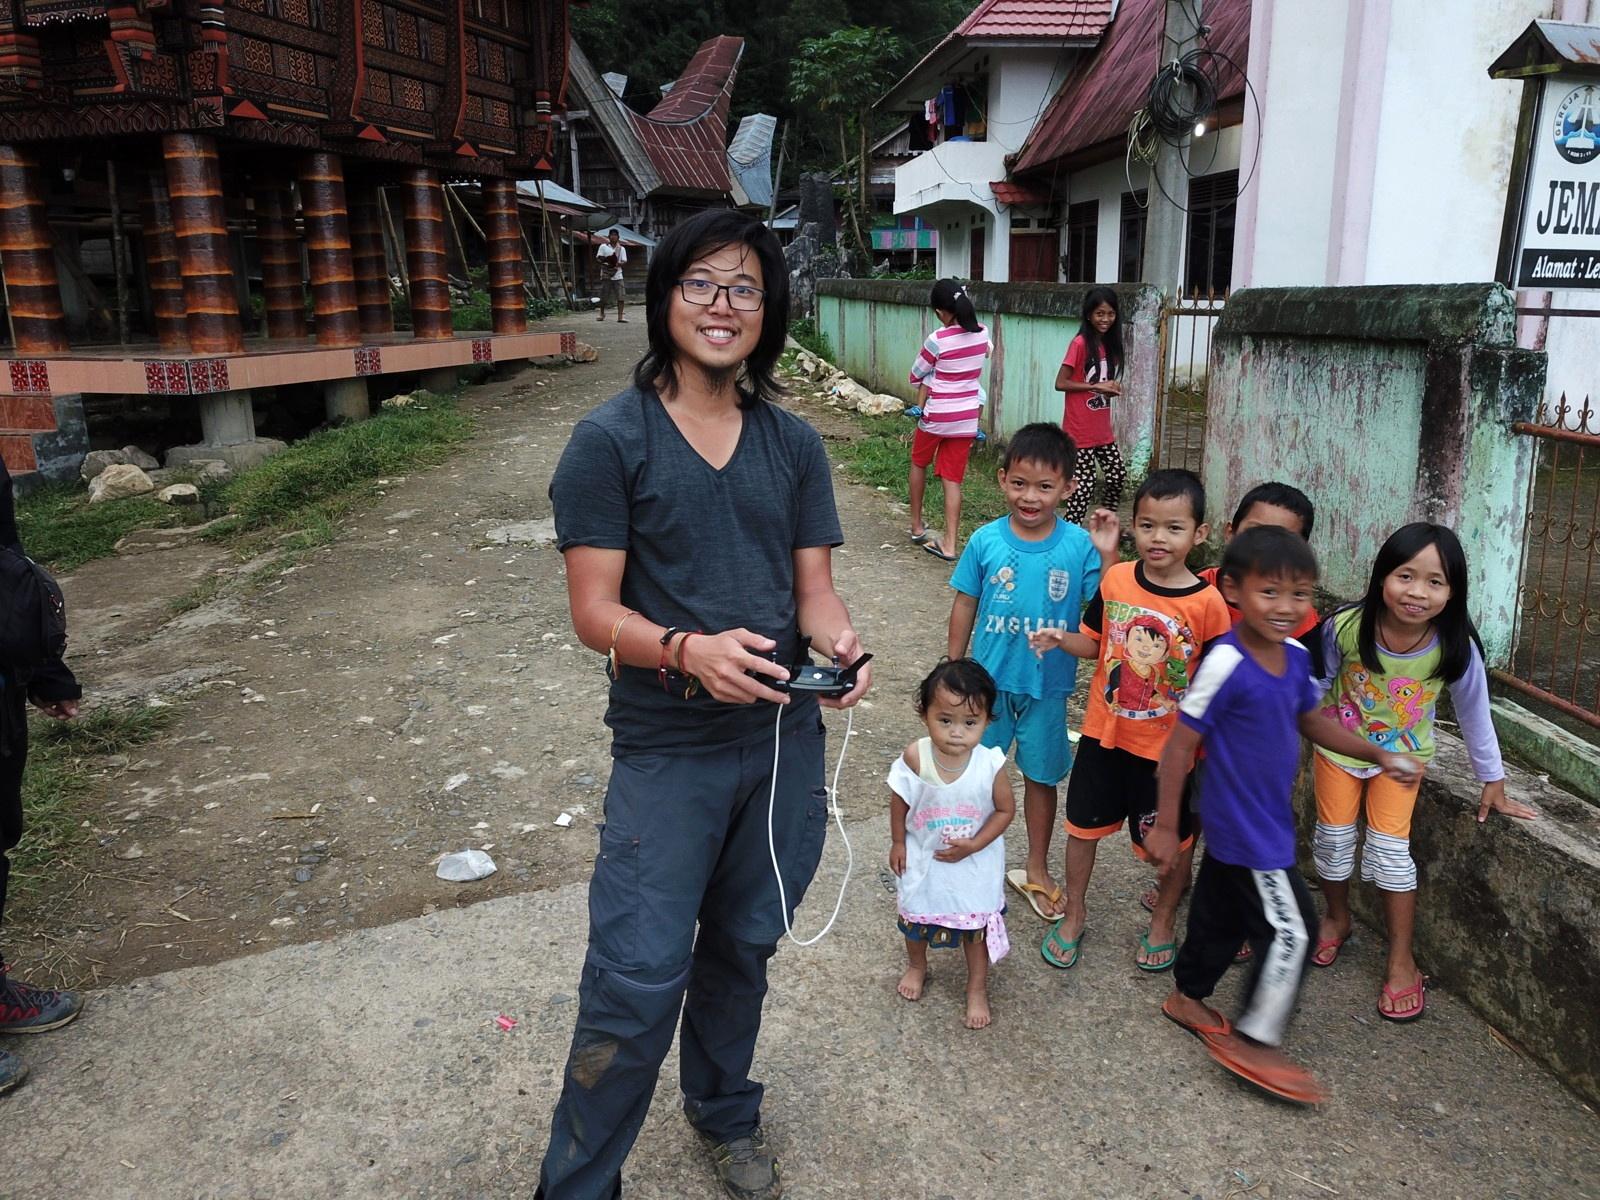 Indonesie_Sulawesi_Toraja_Rantepao DJI_0583